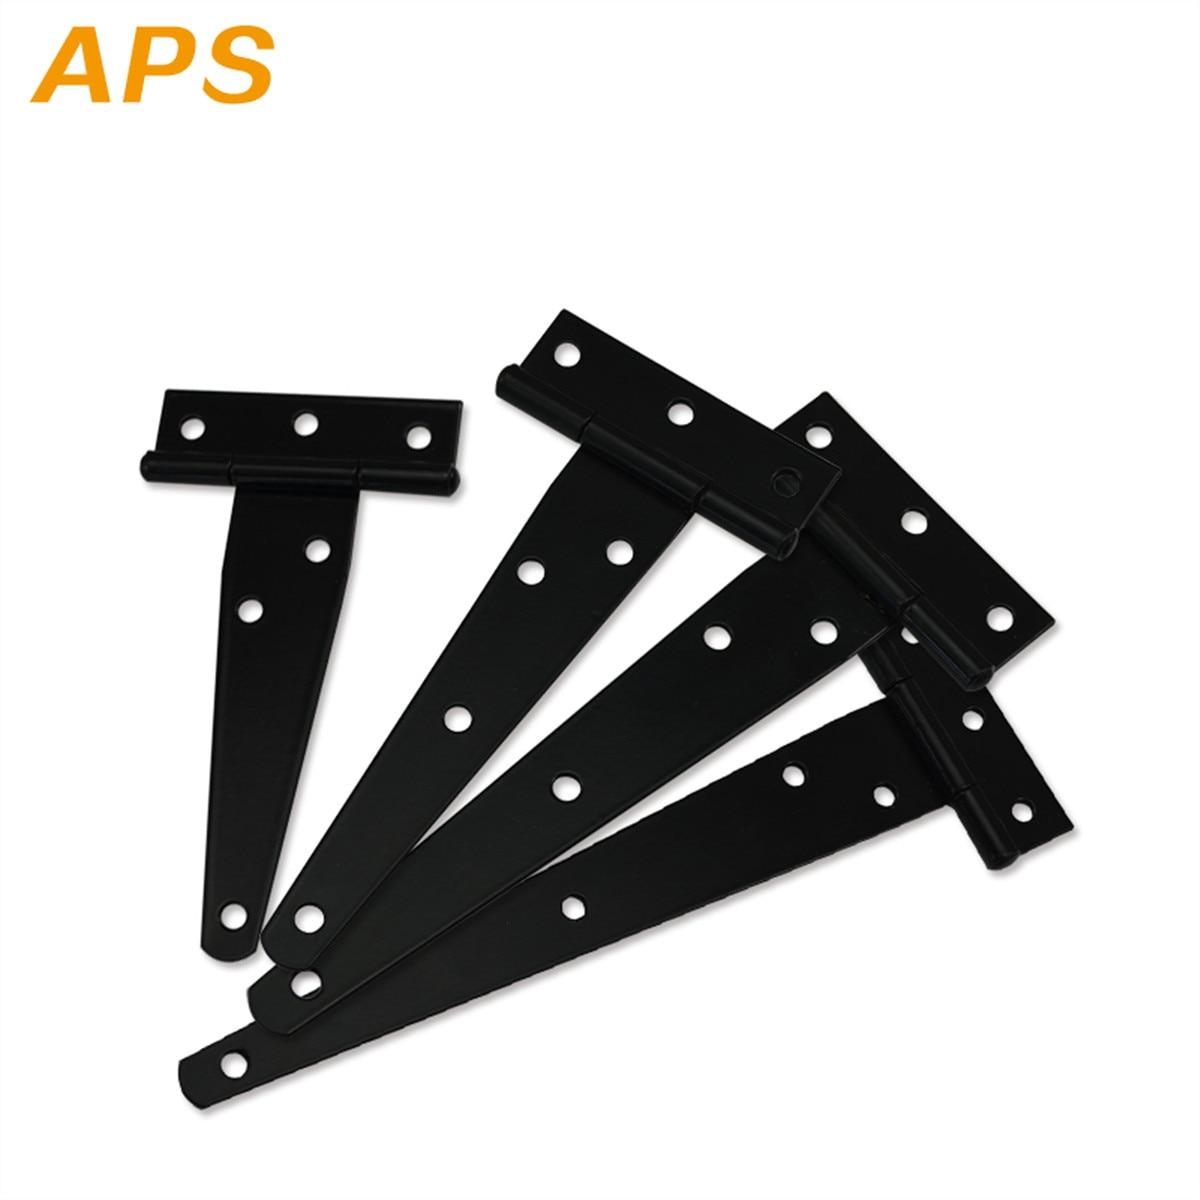 1pcs 4/5/6/8inch Iron Tee Hinge Black T Hinges Cabinet Hinge Garden Shed  Wooden Door Gate For Light Gates Doors Furniture